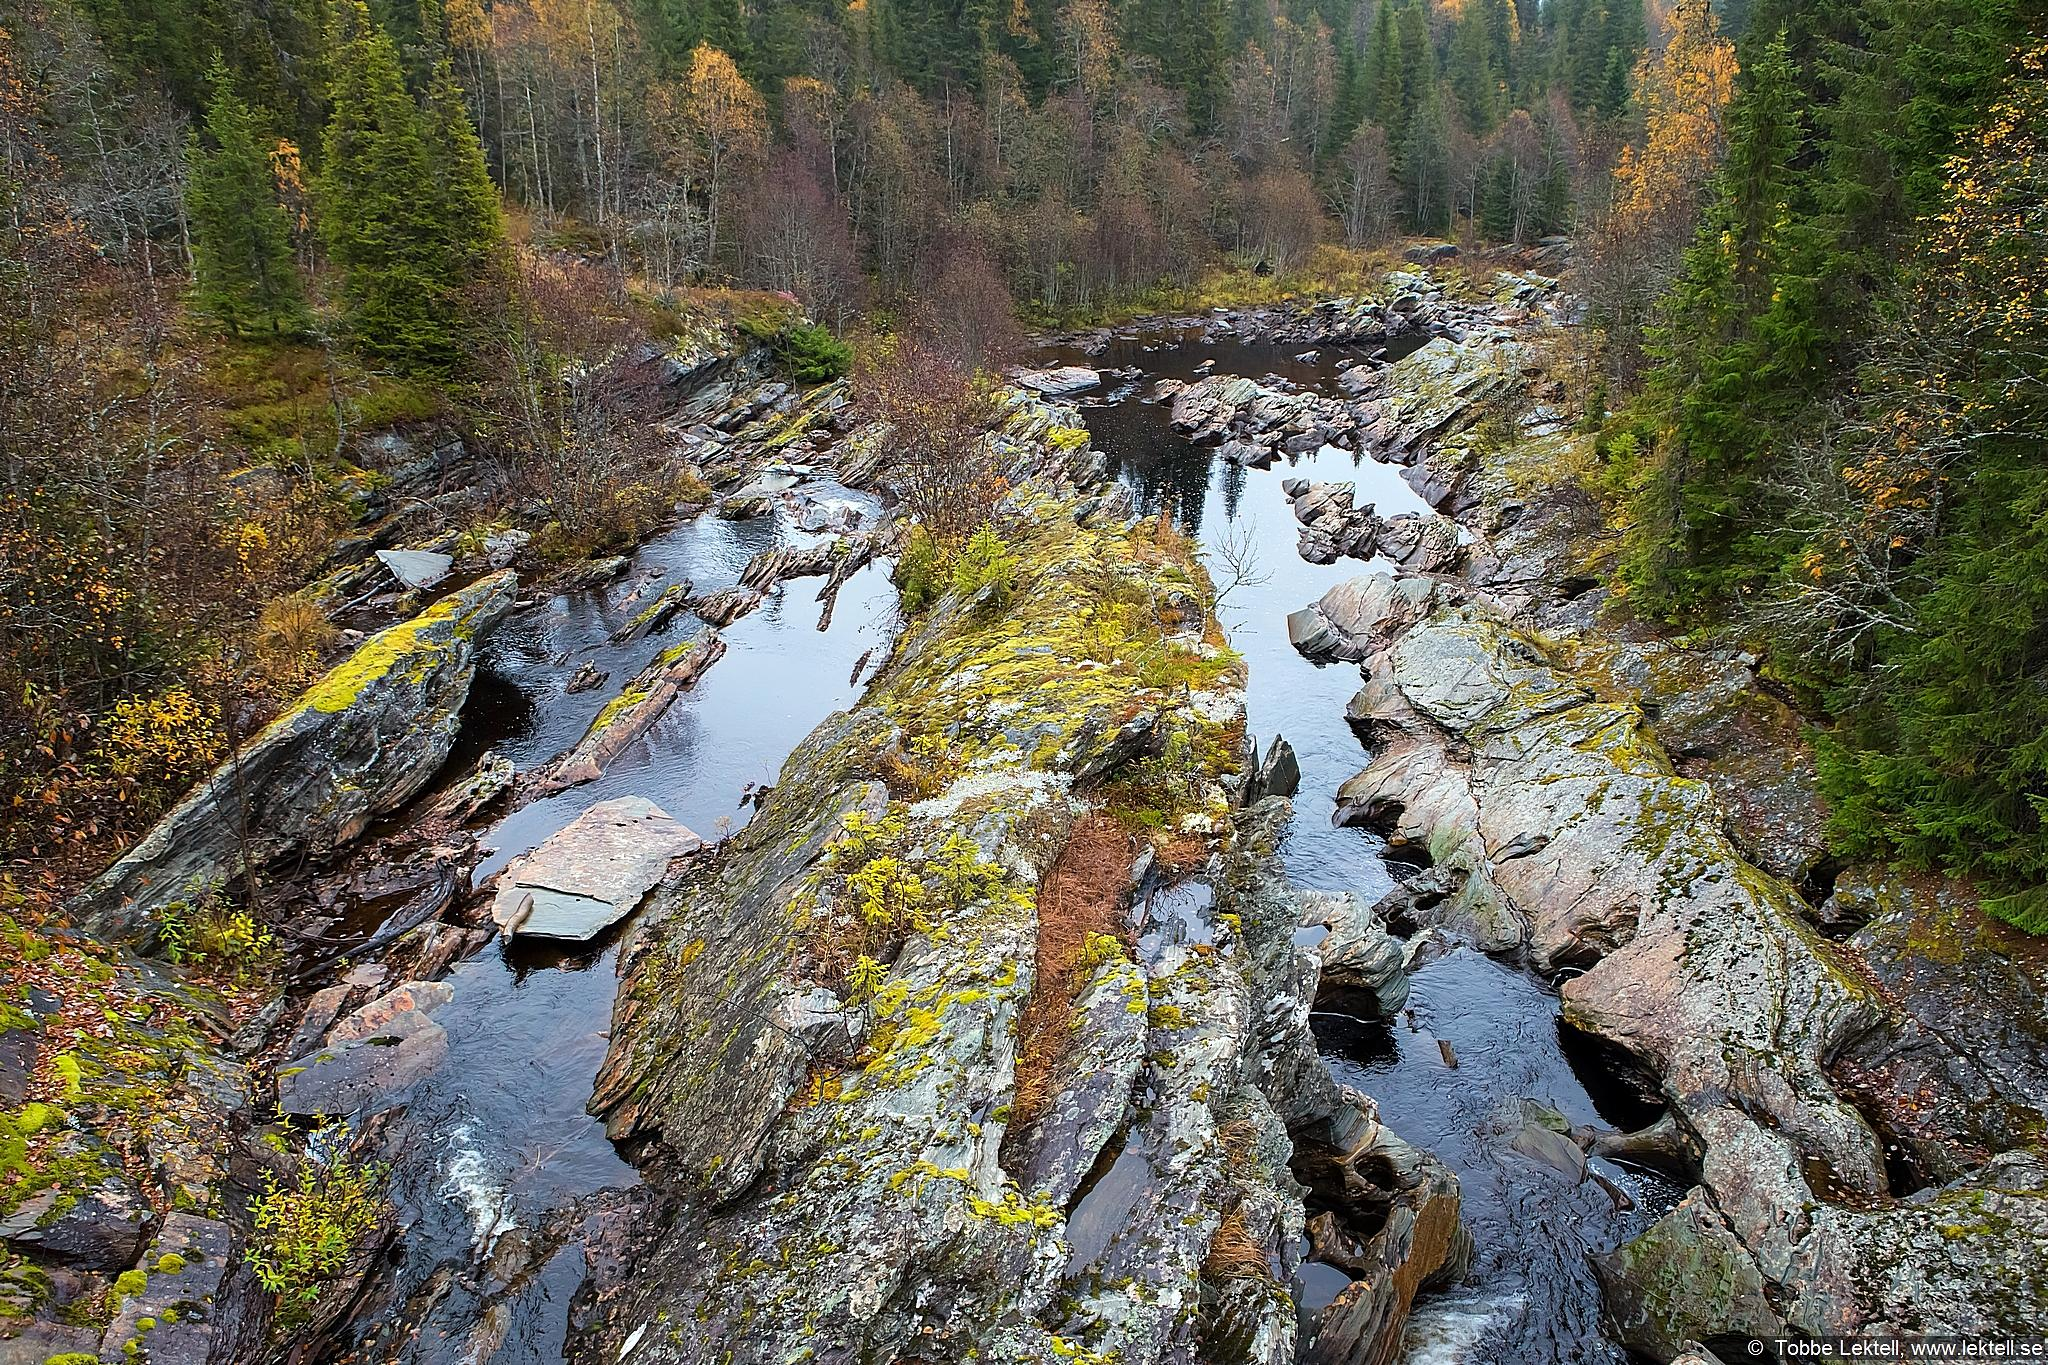 Autumn creek 2 by tobbe.lektell